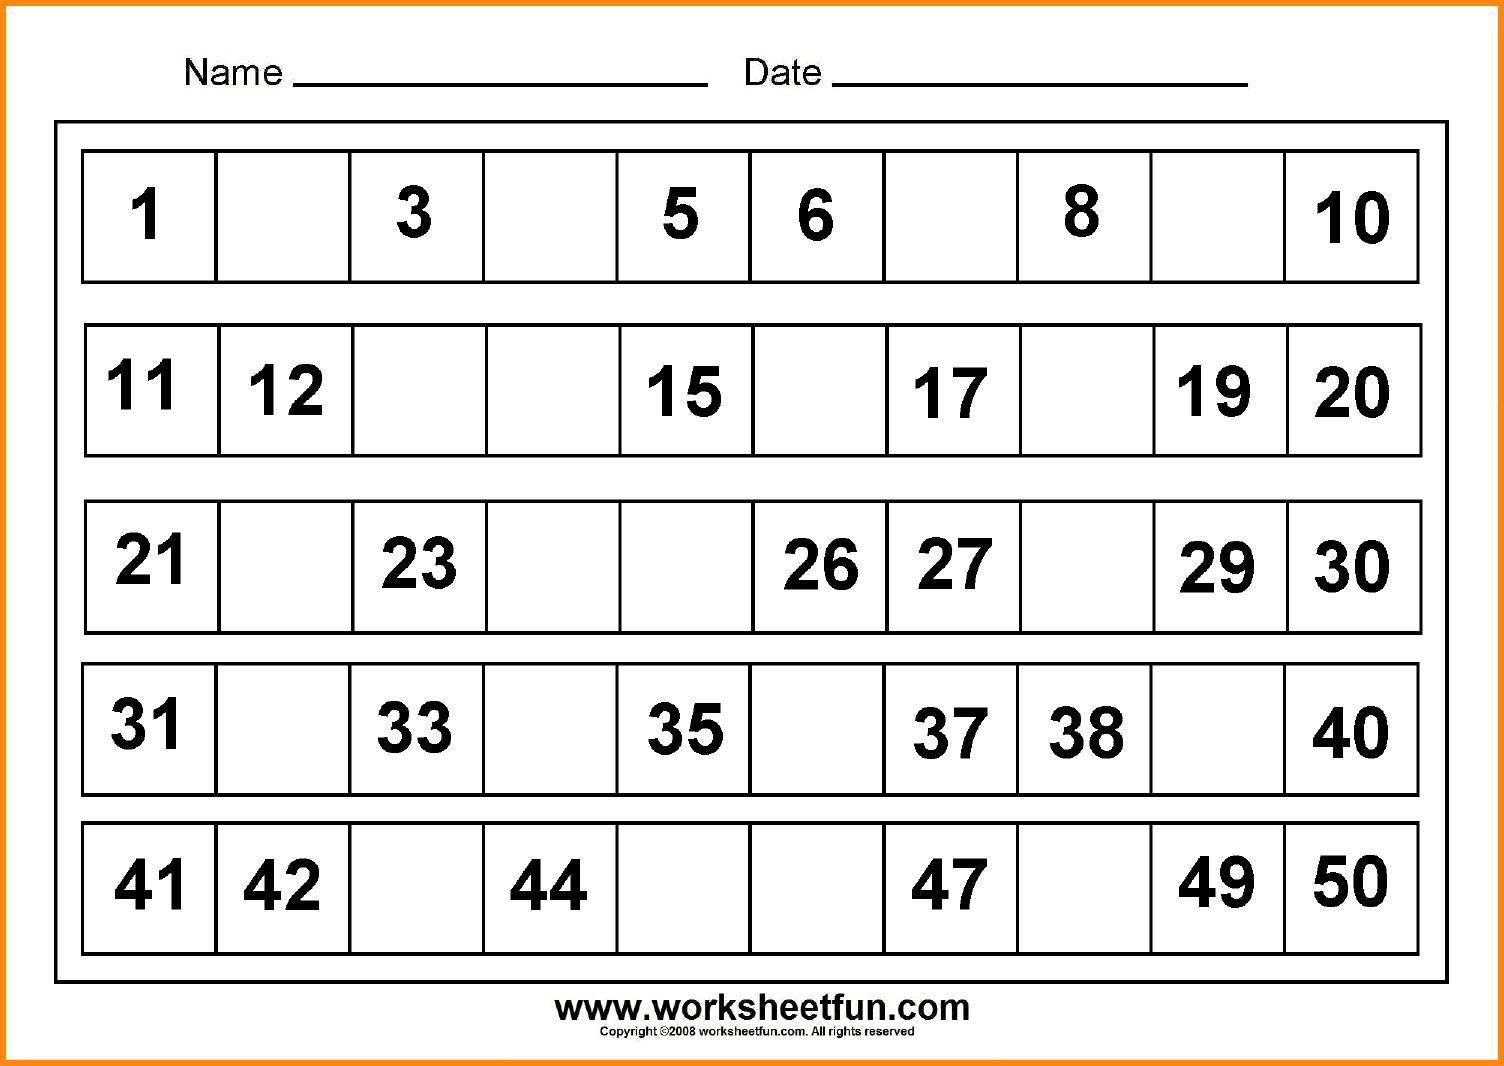 Missing Numbers Worksheets. Number. Alistairtheoptimist Free - Free Printable Missing Number Worksheets